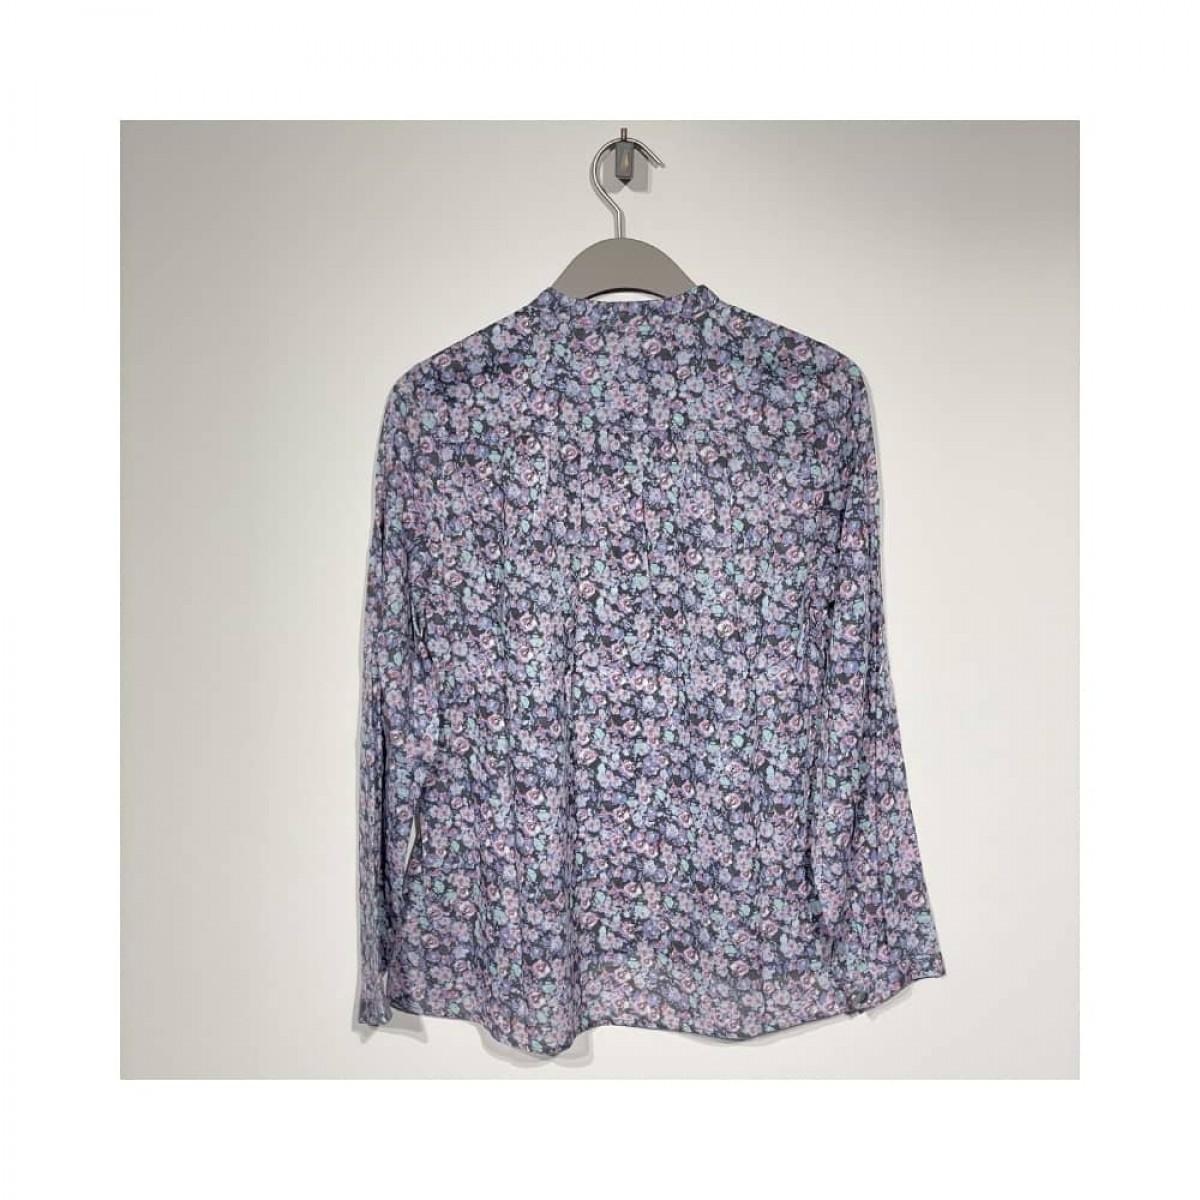 maria skjorte - multi color - ryggen